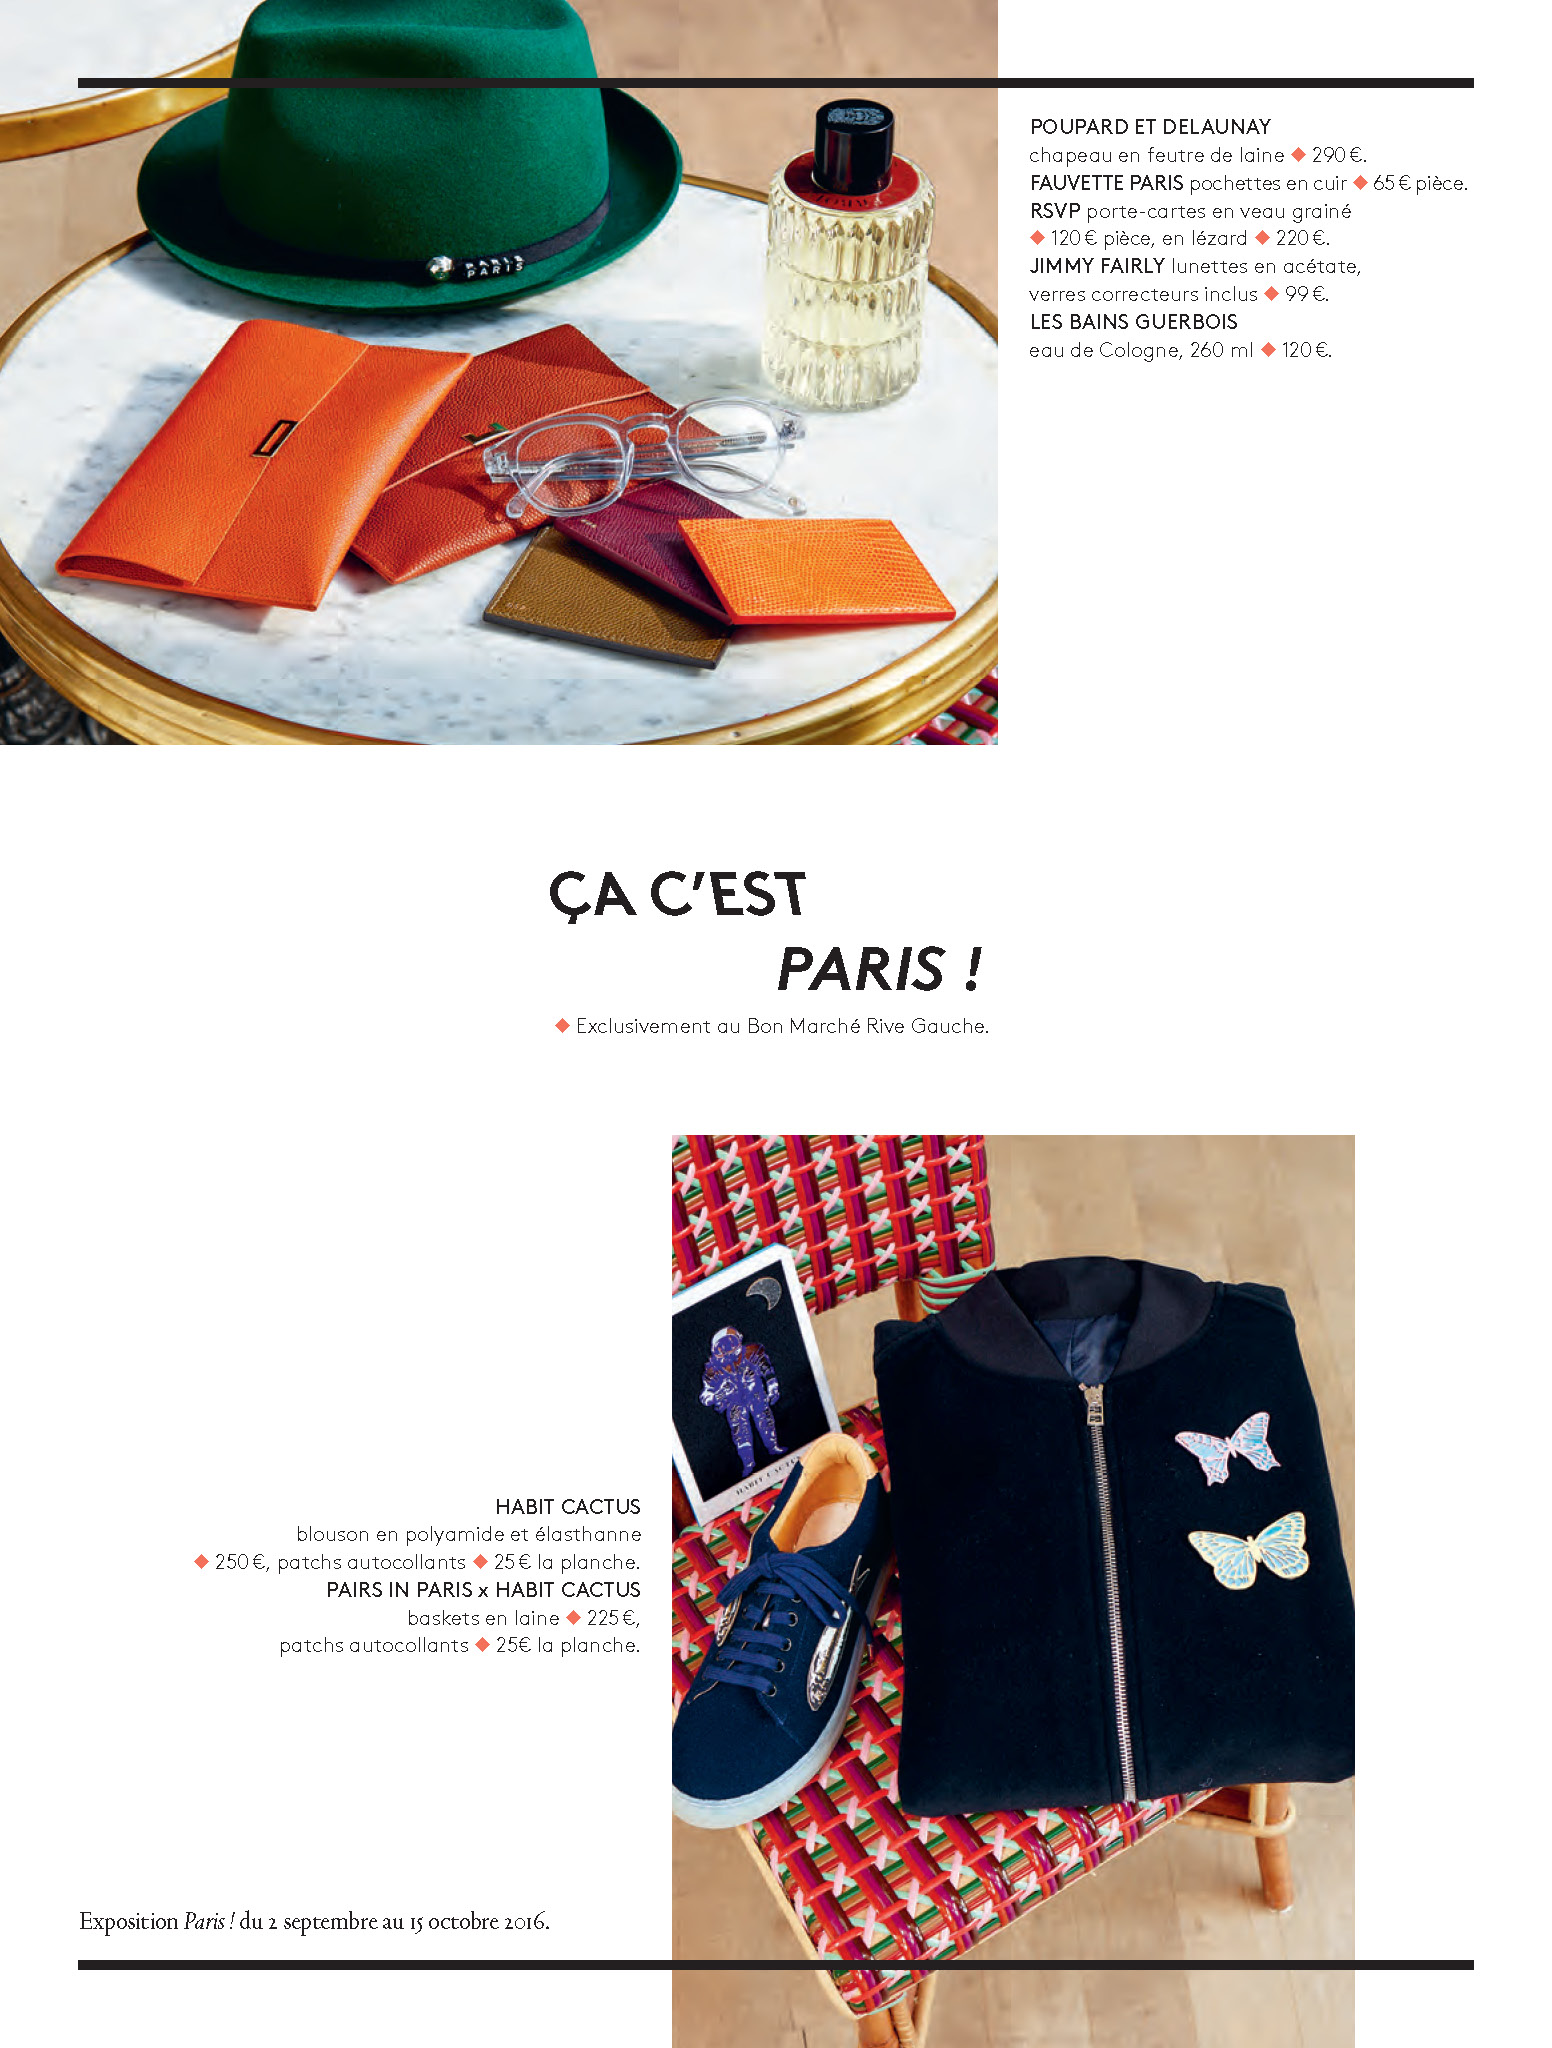 bm-esprit-paris-ah16_Page_019.jpg